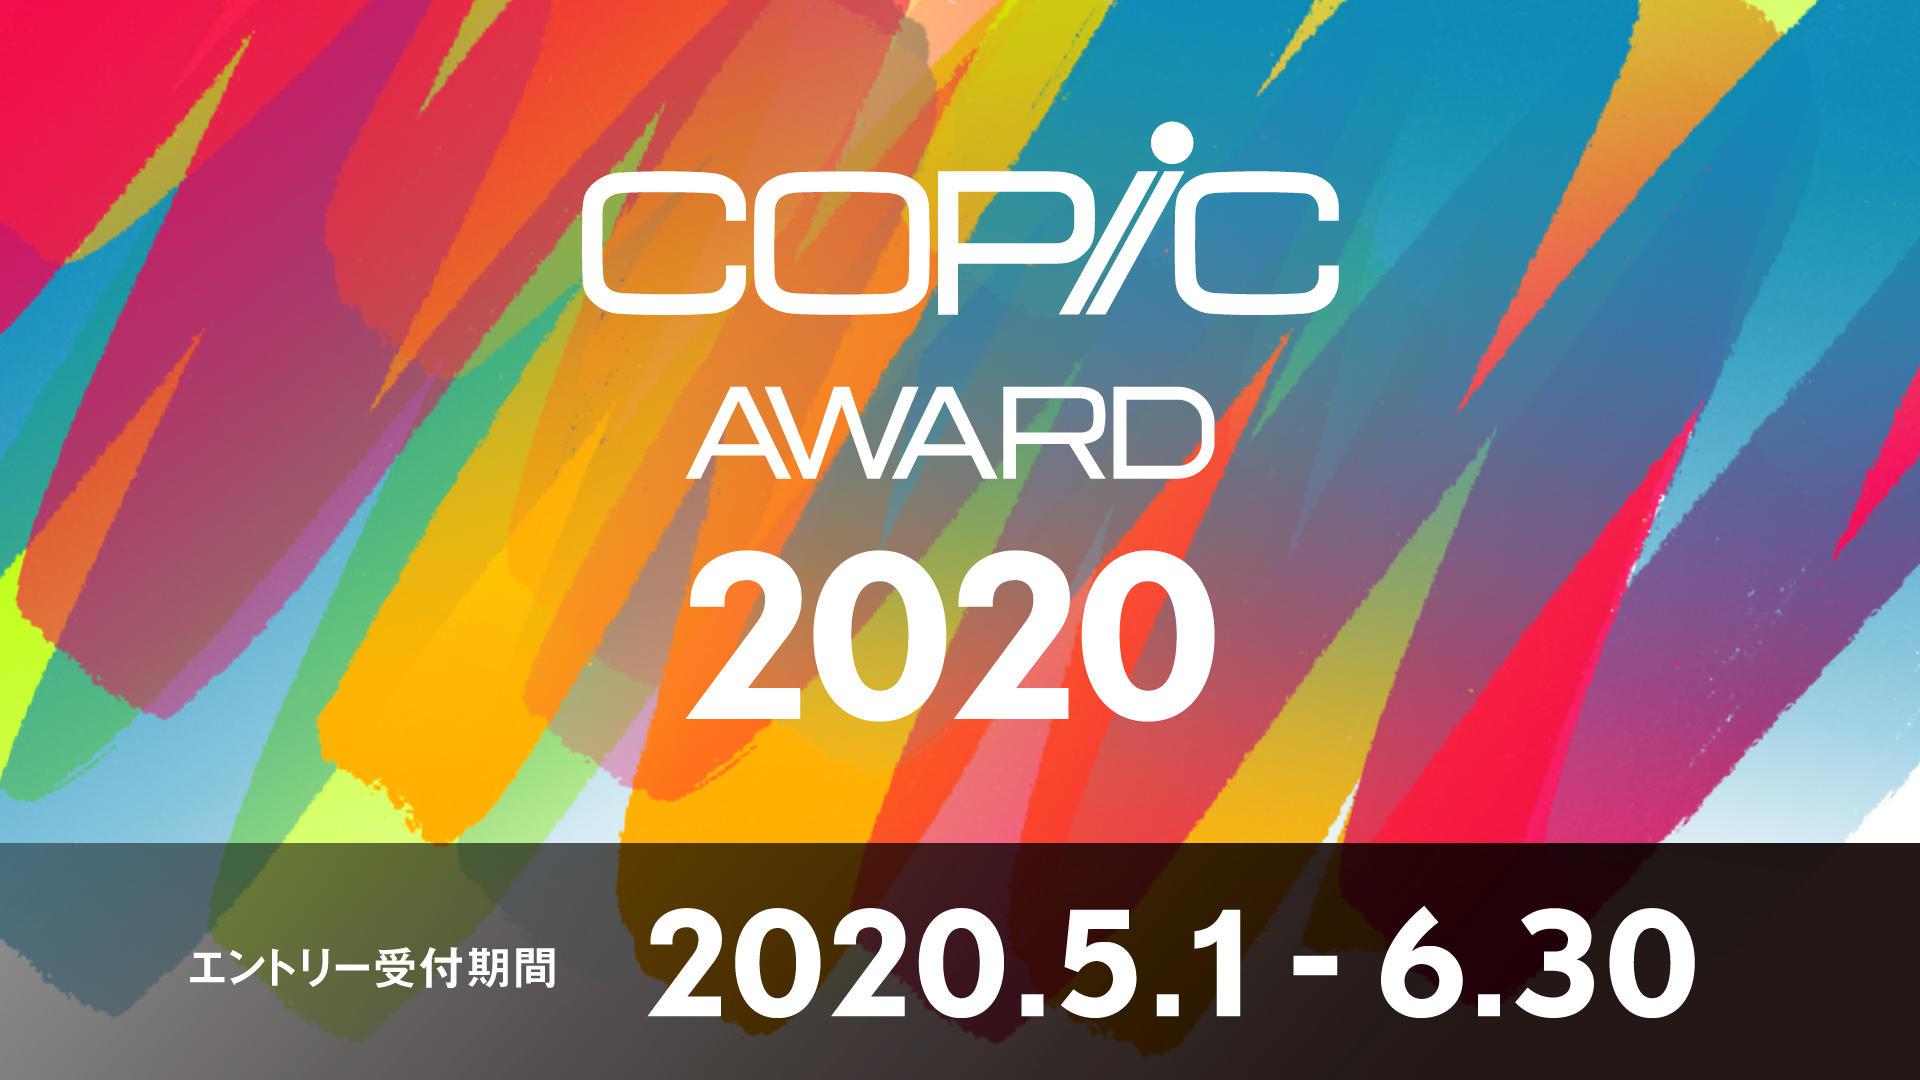 copicaward_banner_1920×1080_jp.jpg